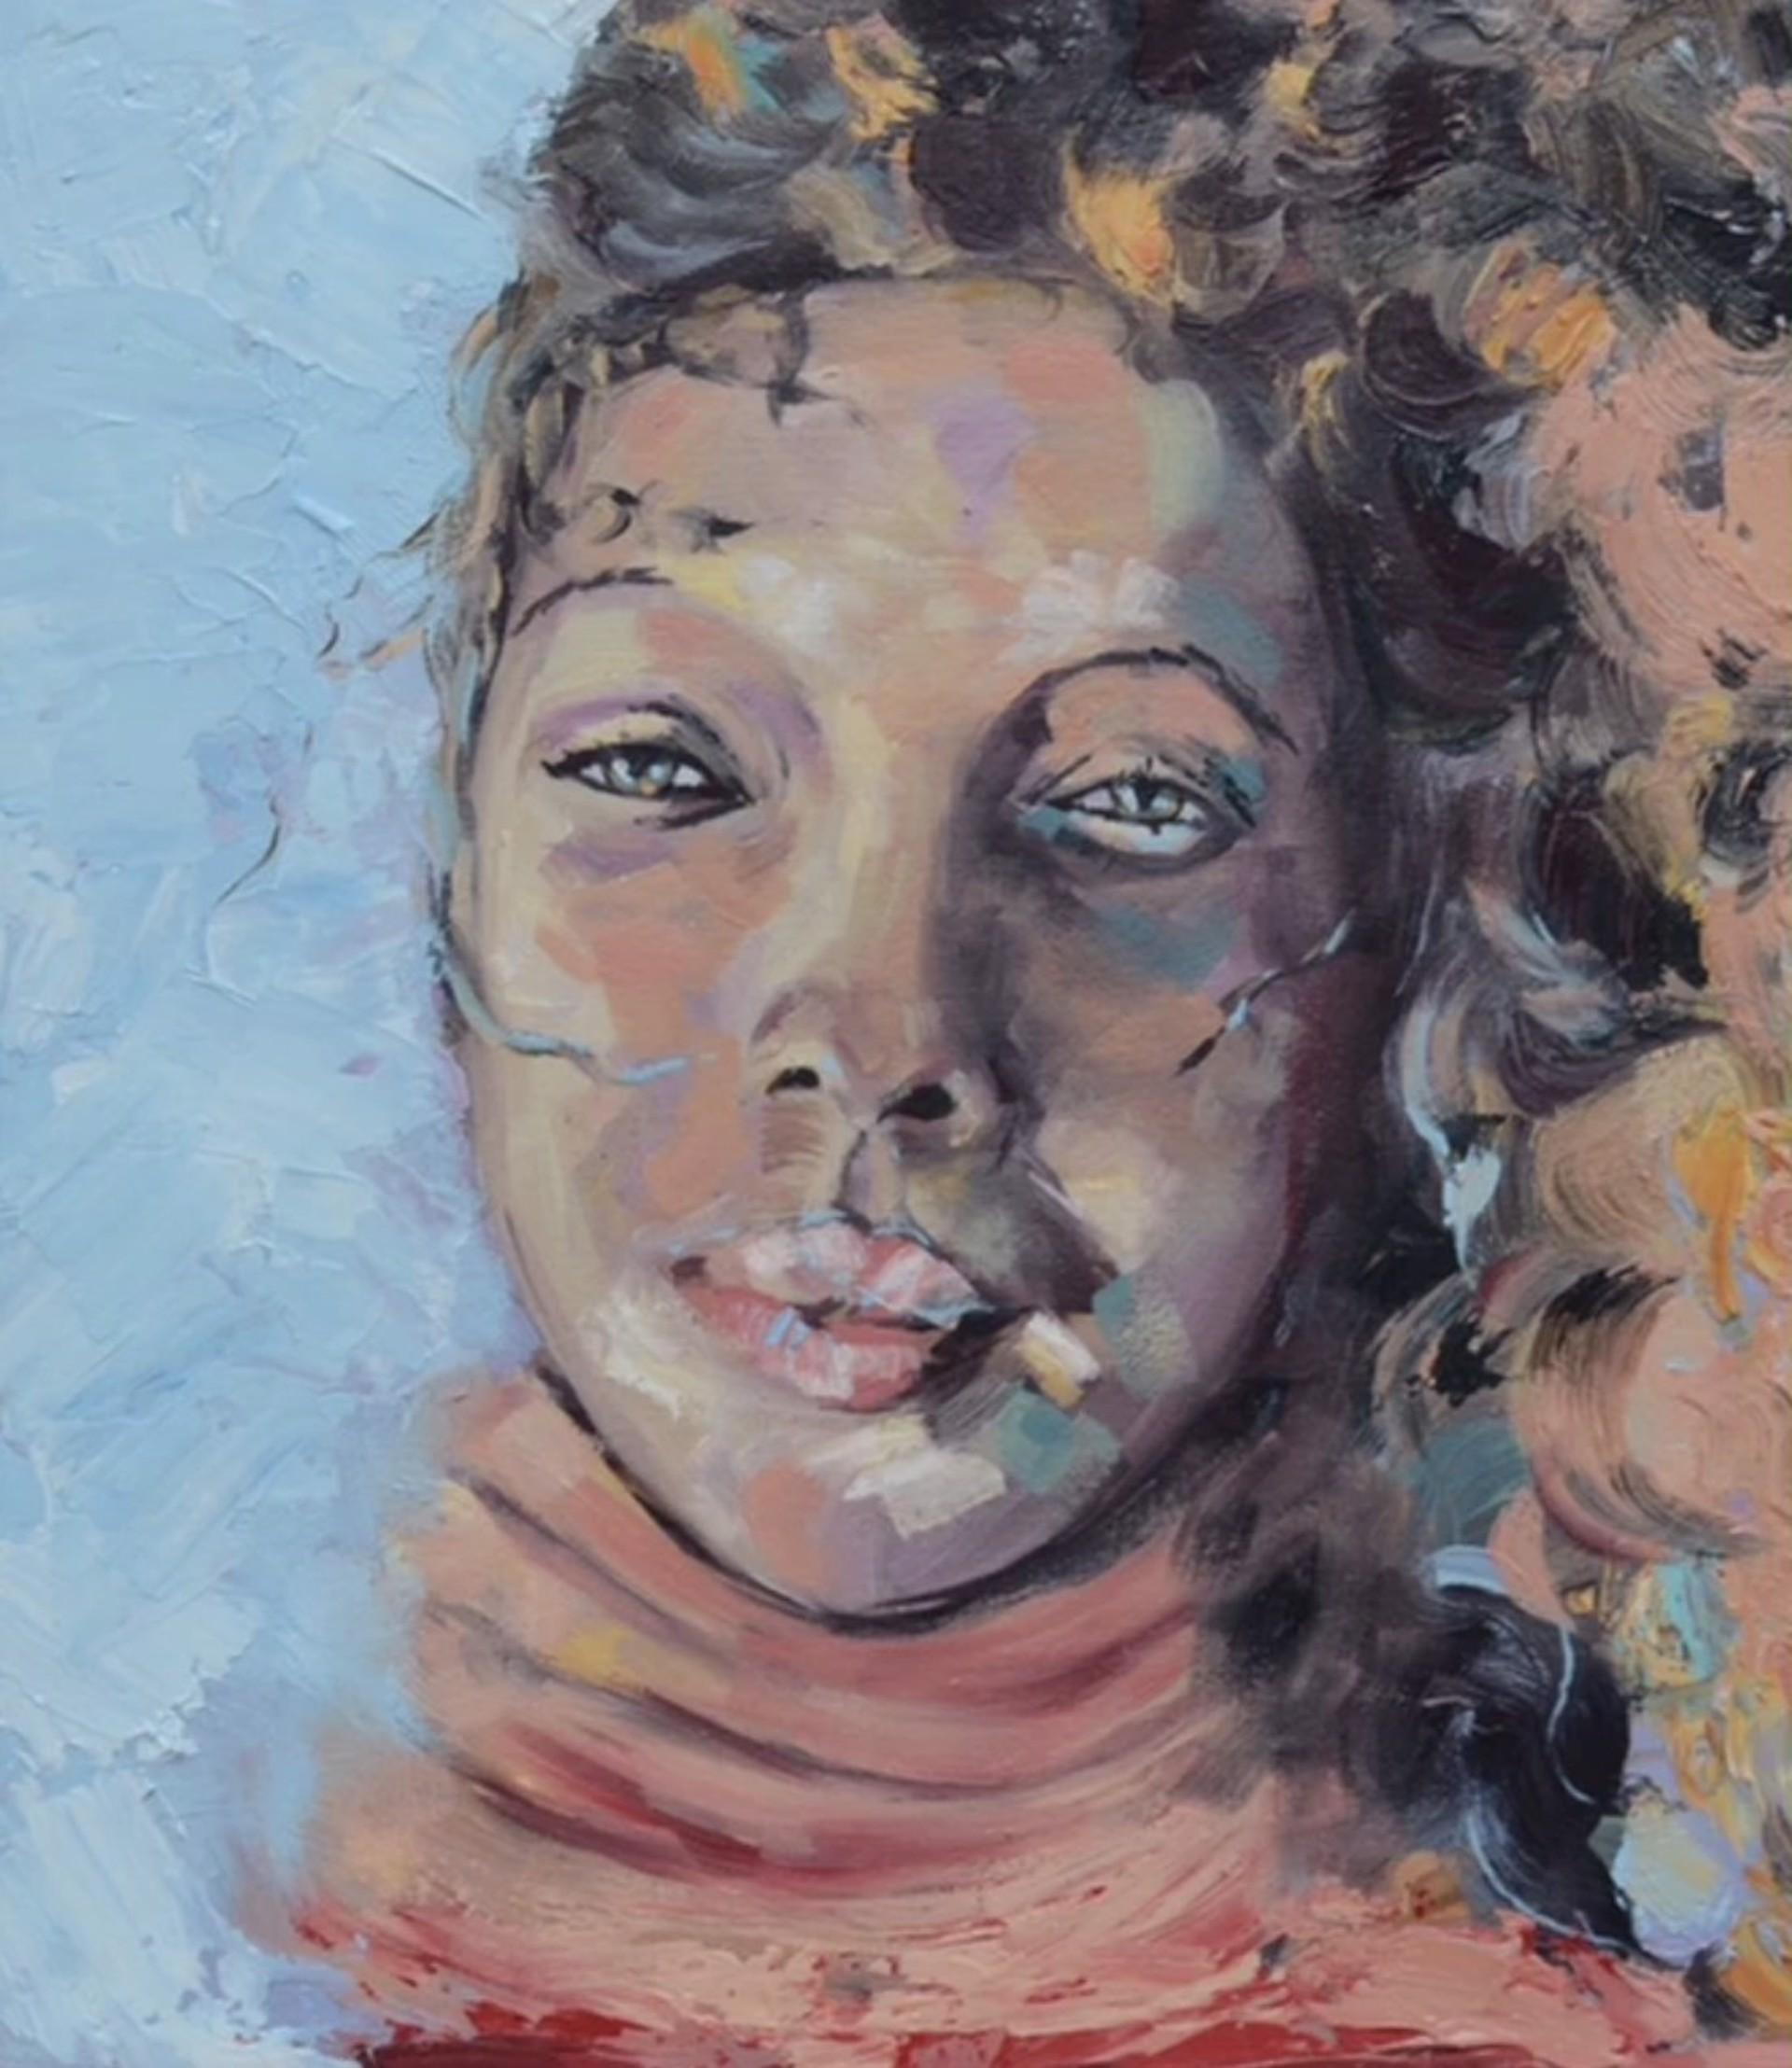 Woven Soul by Charley Jones